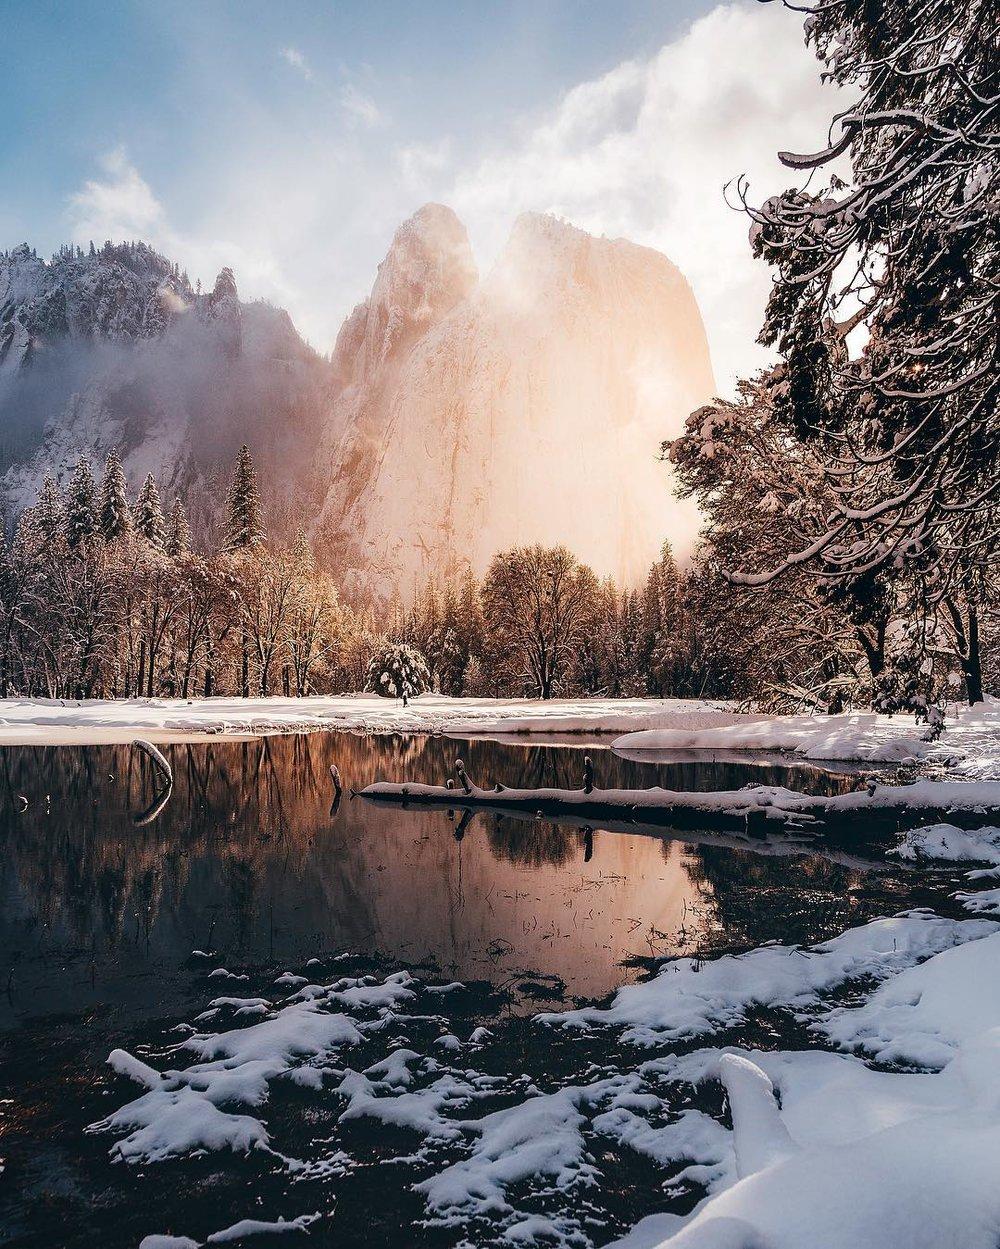 Yosemite El Capitan National Park Winter February Sunset